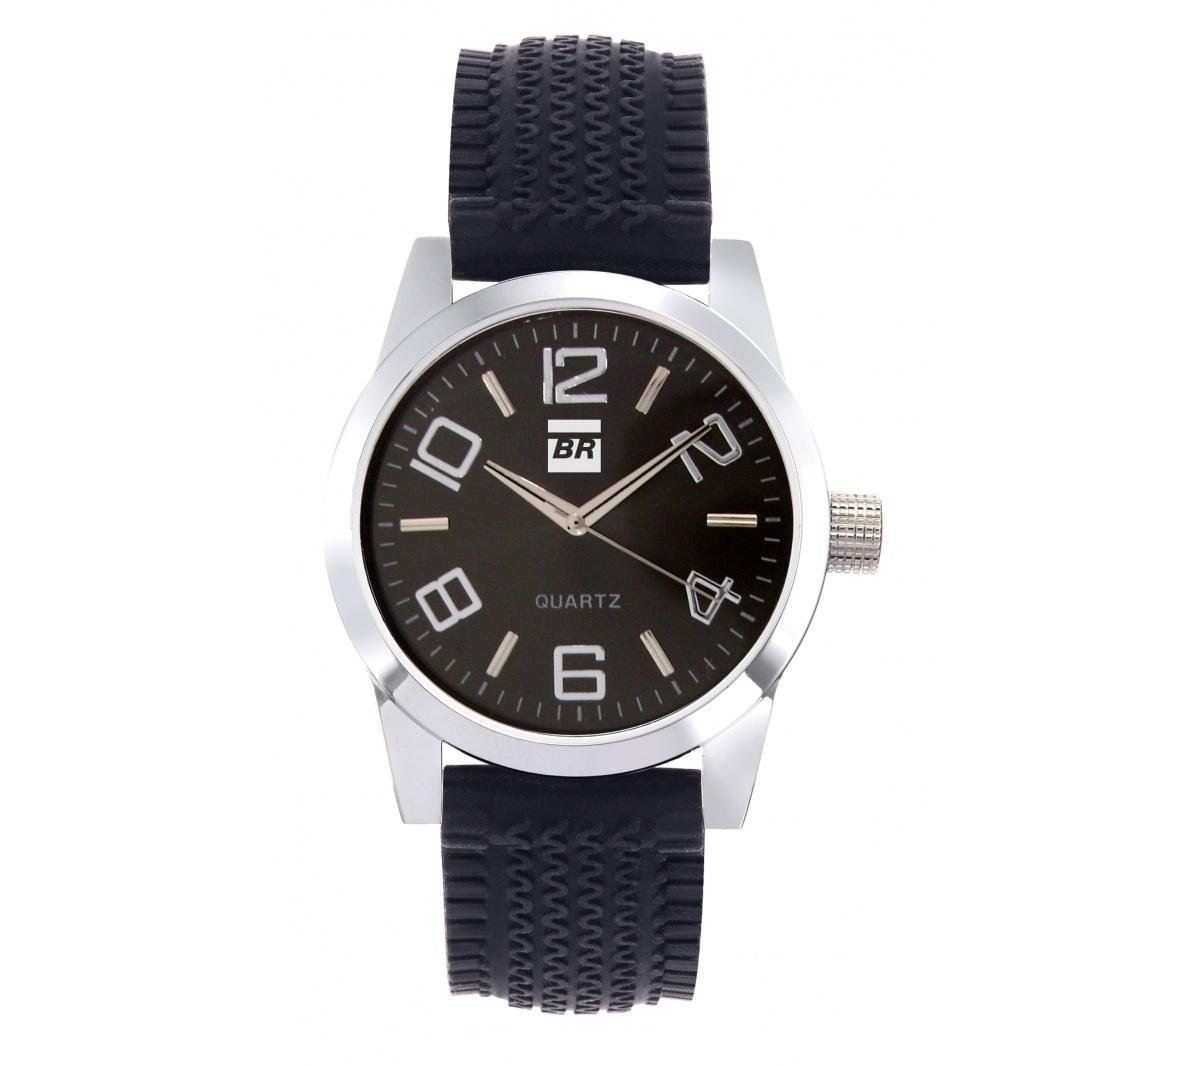 44a5ba6e54b Brinde relógio de pulso masculino FBRM-B50P - Flic Brindes